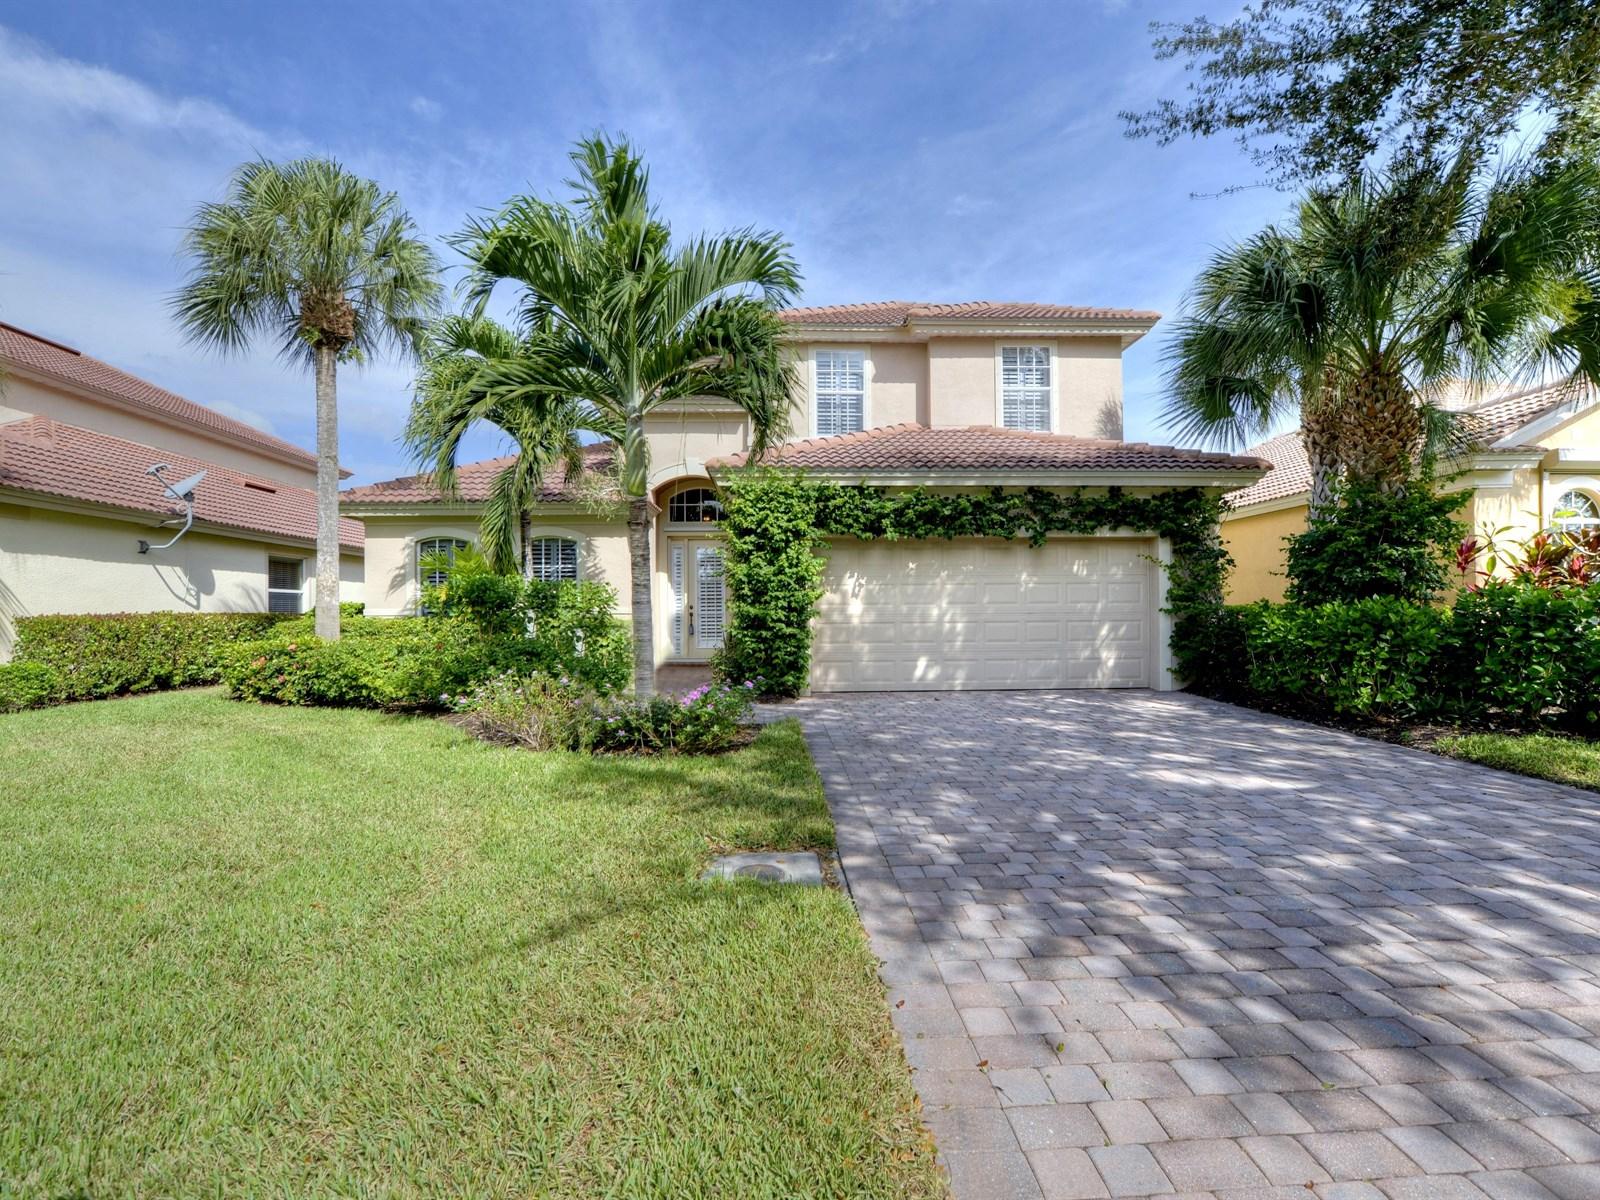 10272 Cobble Hill Rd, Hawthorne, Bonita Springs FL